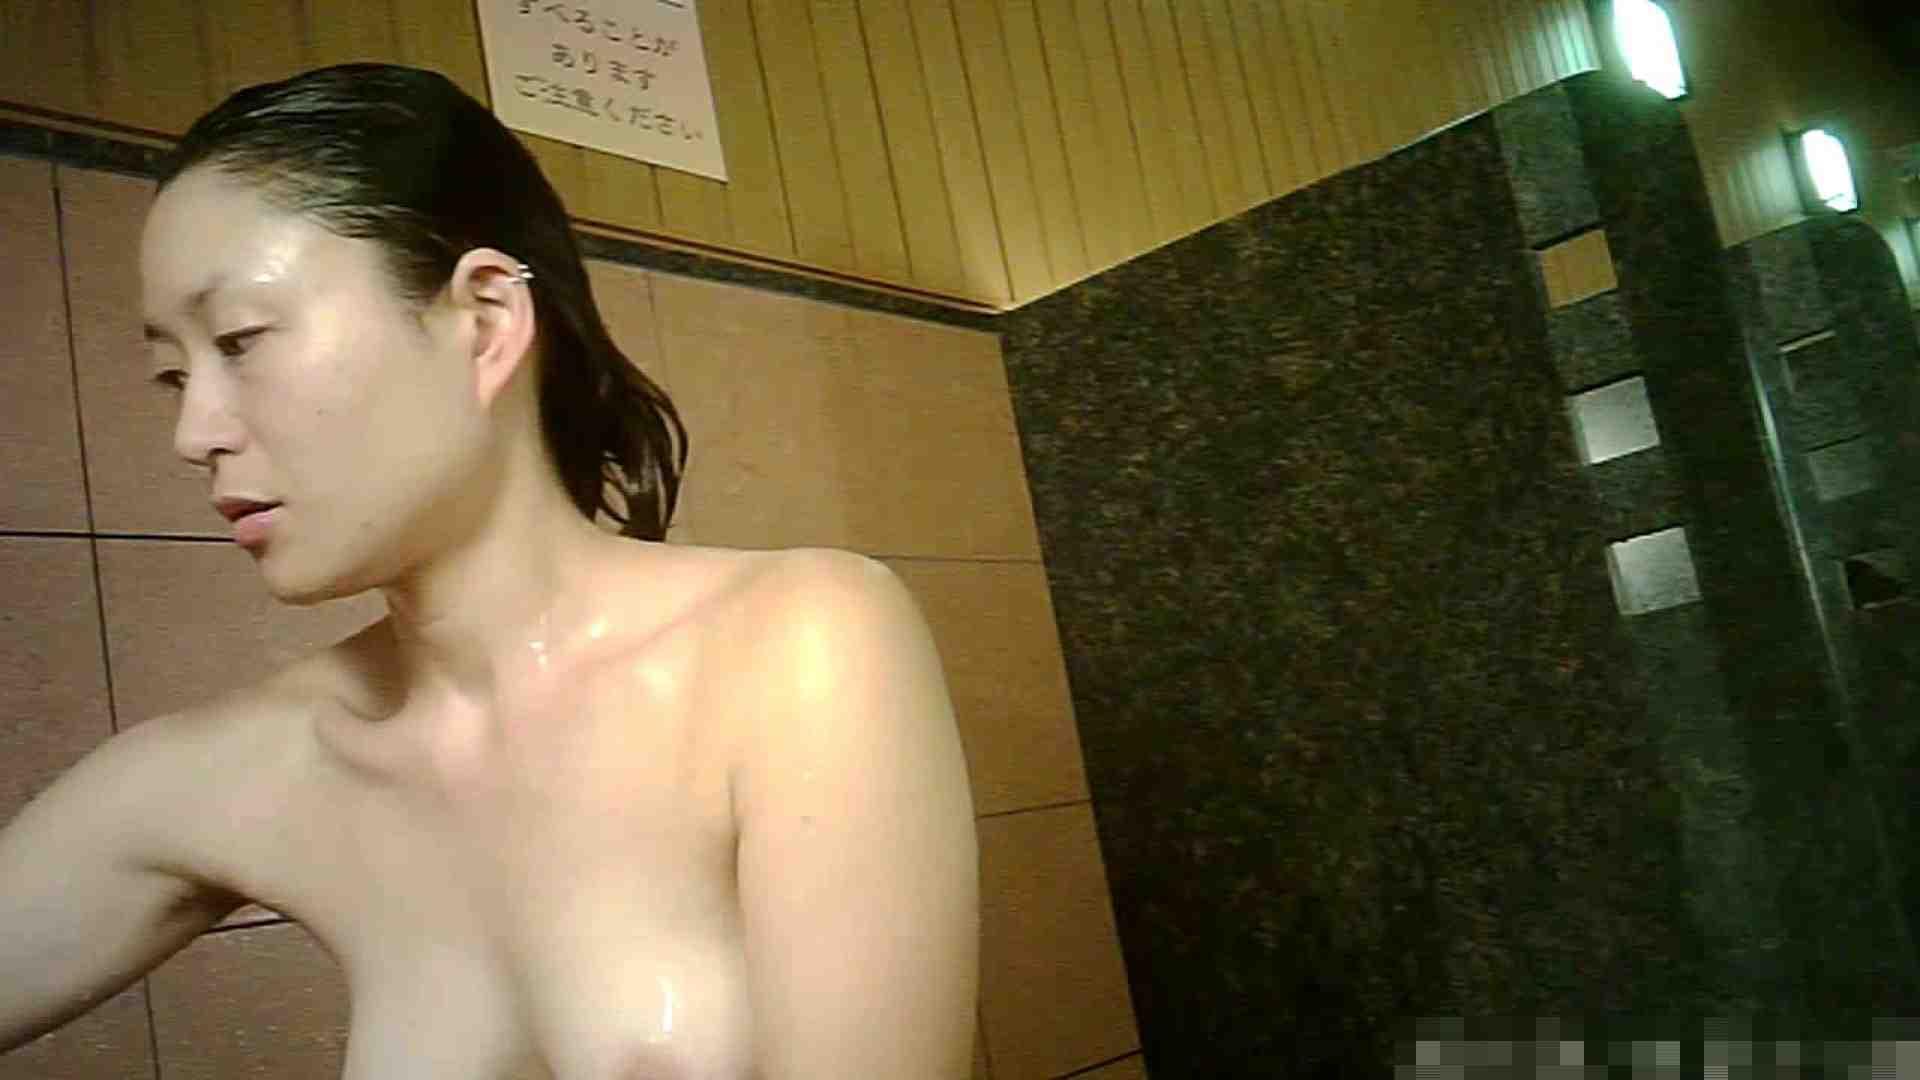 No.1 洗い場!!とっても綺麗な身体のお女市さん、乳首も綺麗です。 女湯 戯れ無修正画像 98画像 45